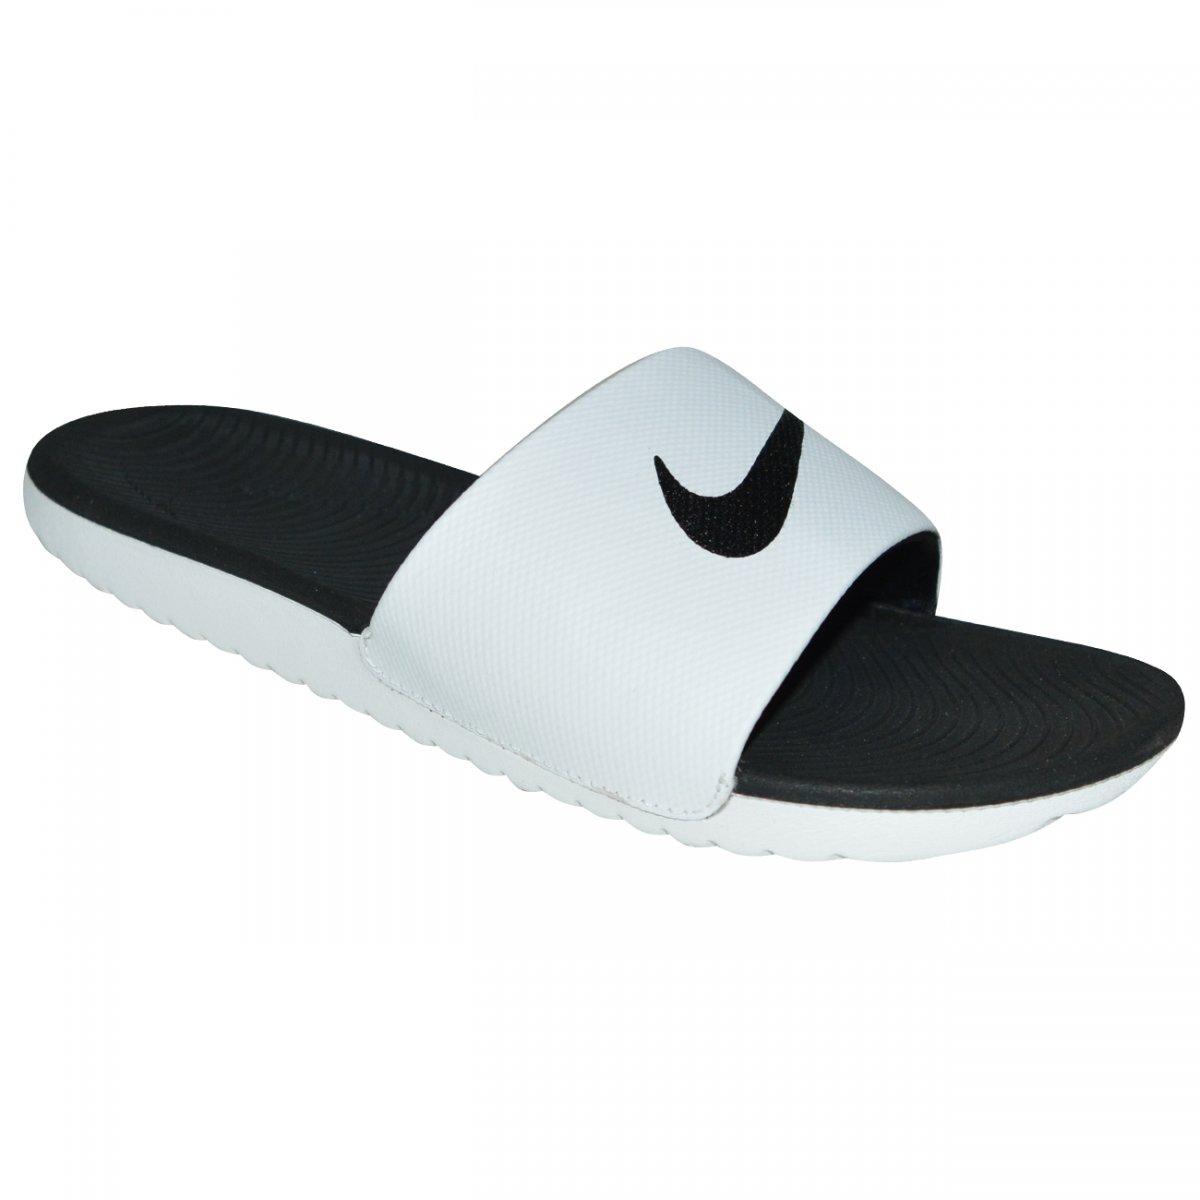 ebed083a3 Chinelo Nike Kawa Slide 832646 100 - Branco/preto - Chuteira Nike, Adidas.  Sandalias Femininas. Sandy Calçados